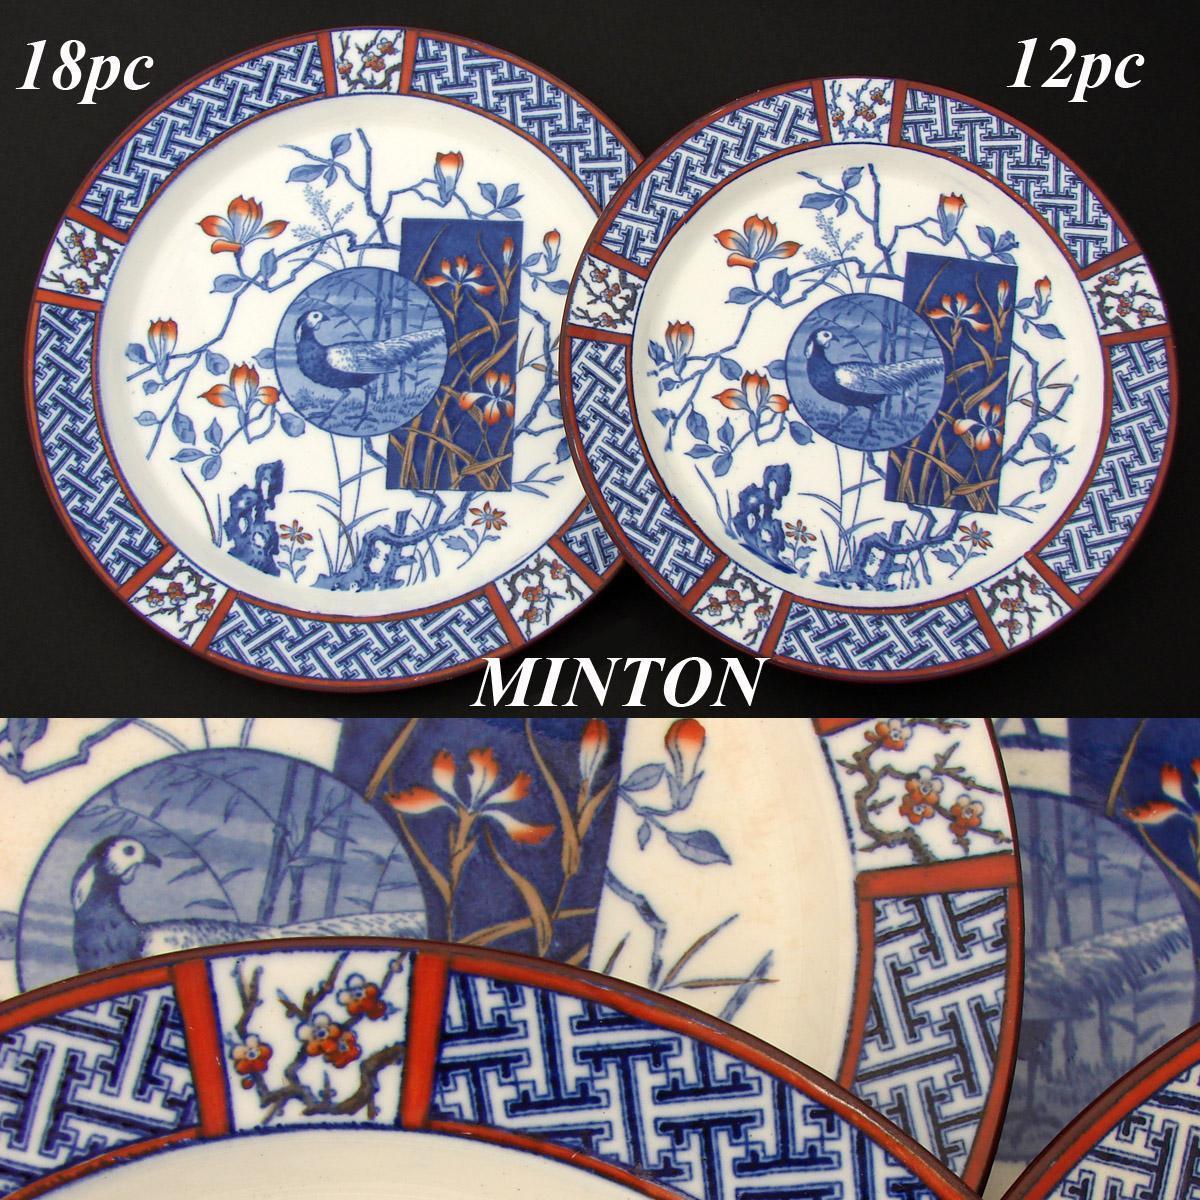 Dating imari plates images